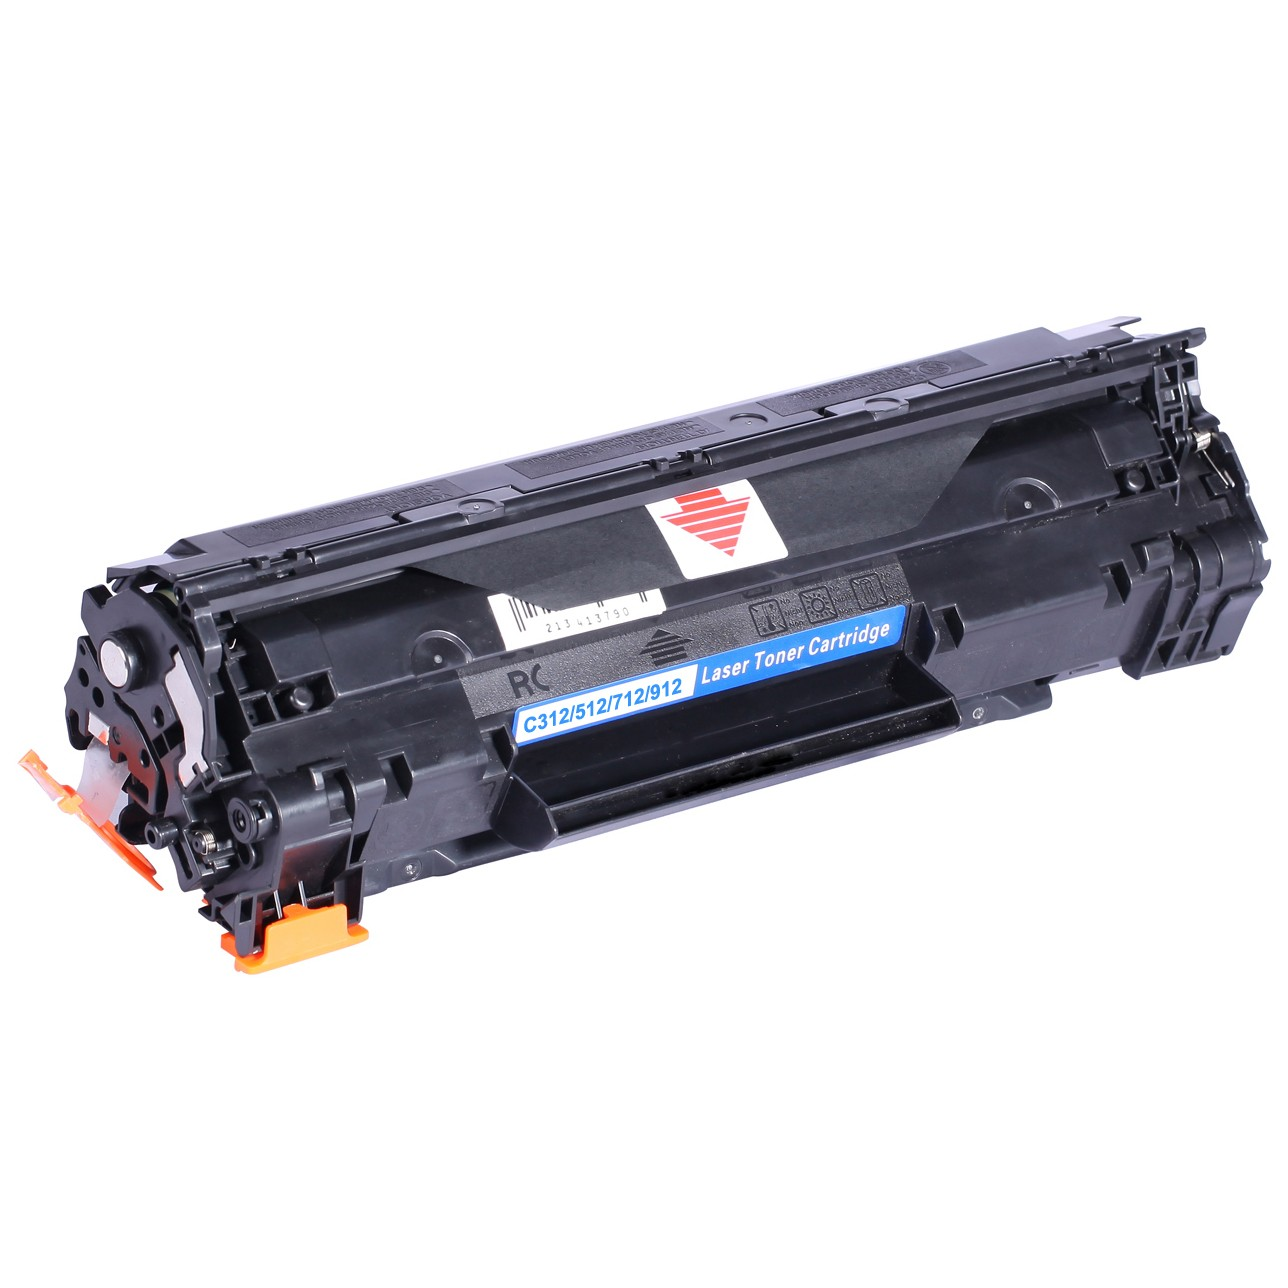 Image of   Canon CRG312/512/712/912 BK Lasertoner sort, kompatibel (1500 sider)